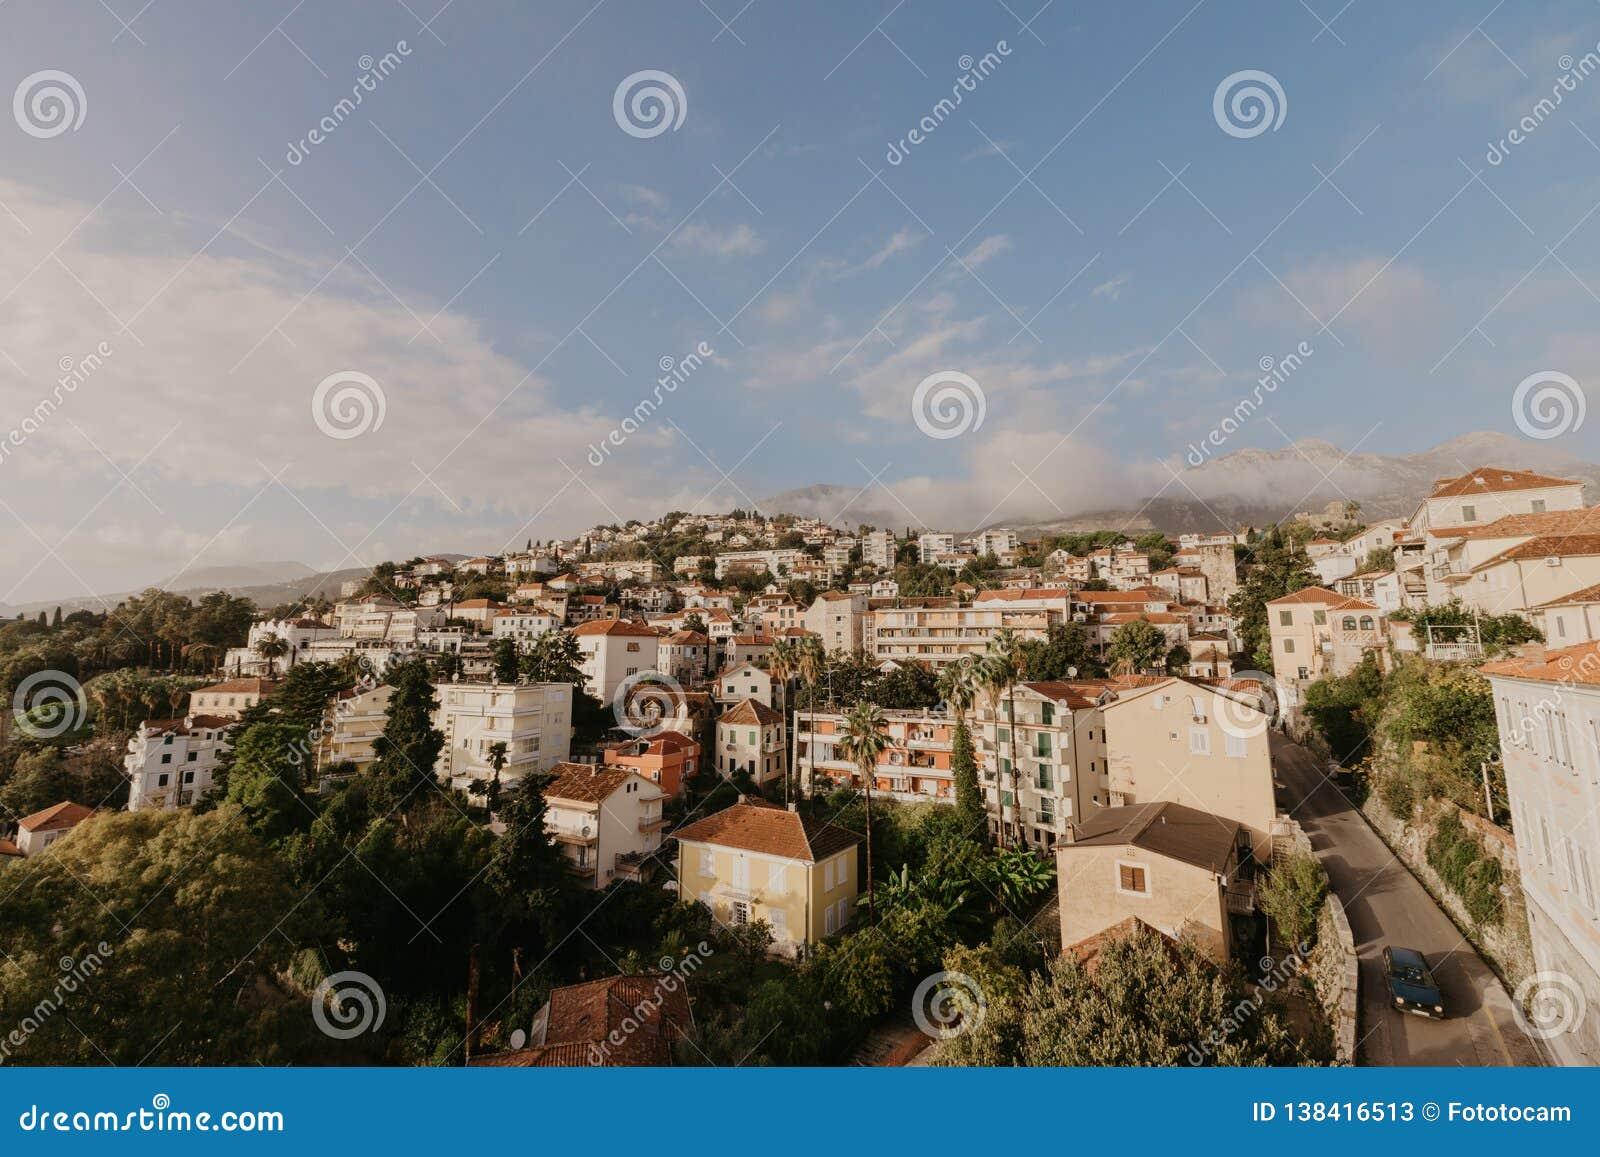 Aerial view of Herceg Novi town, marina and Venetian Forte Mare, Boka Kotorska bay of Adriatic sea, Montenegro - Image